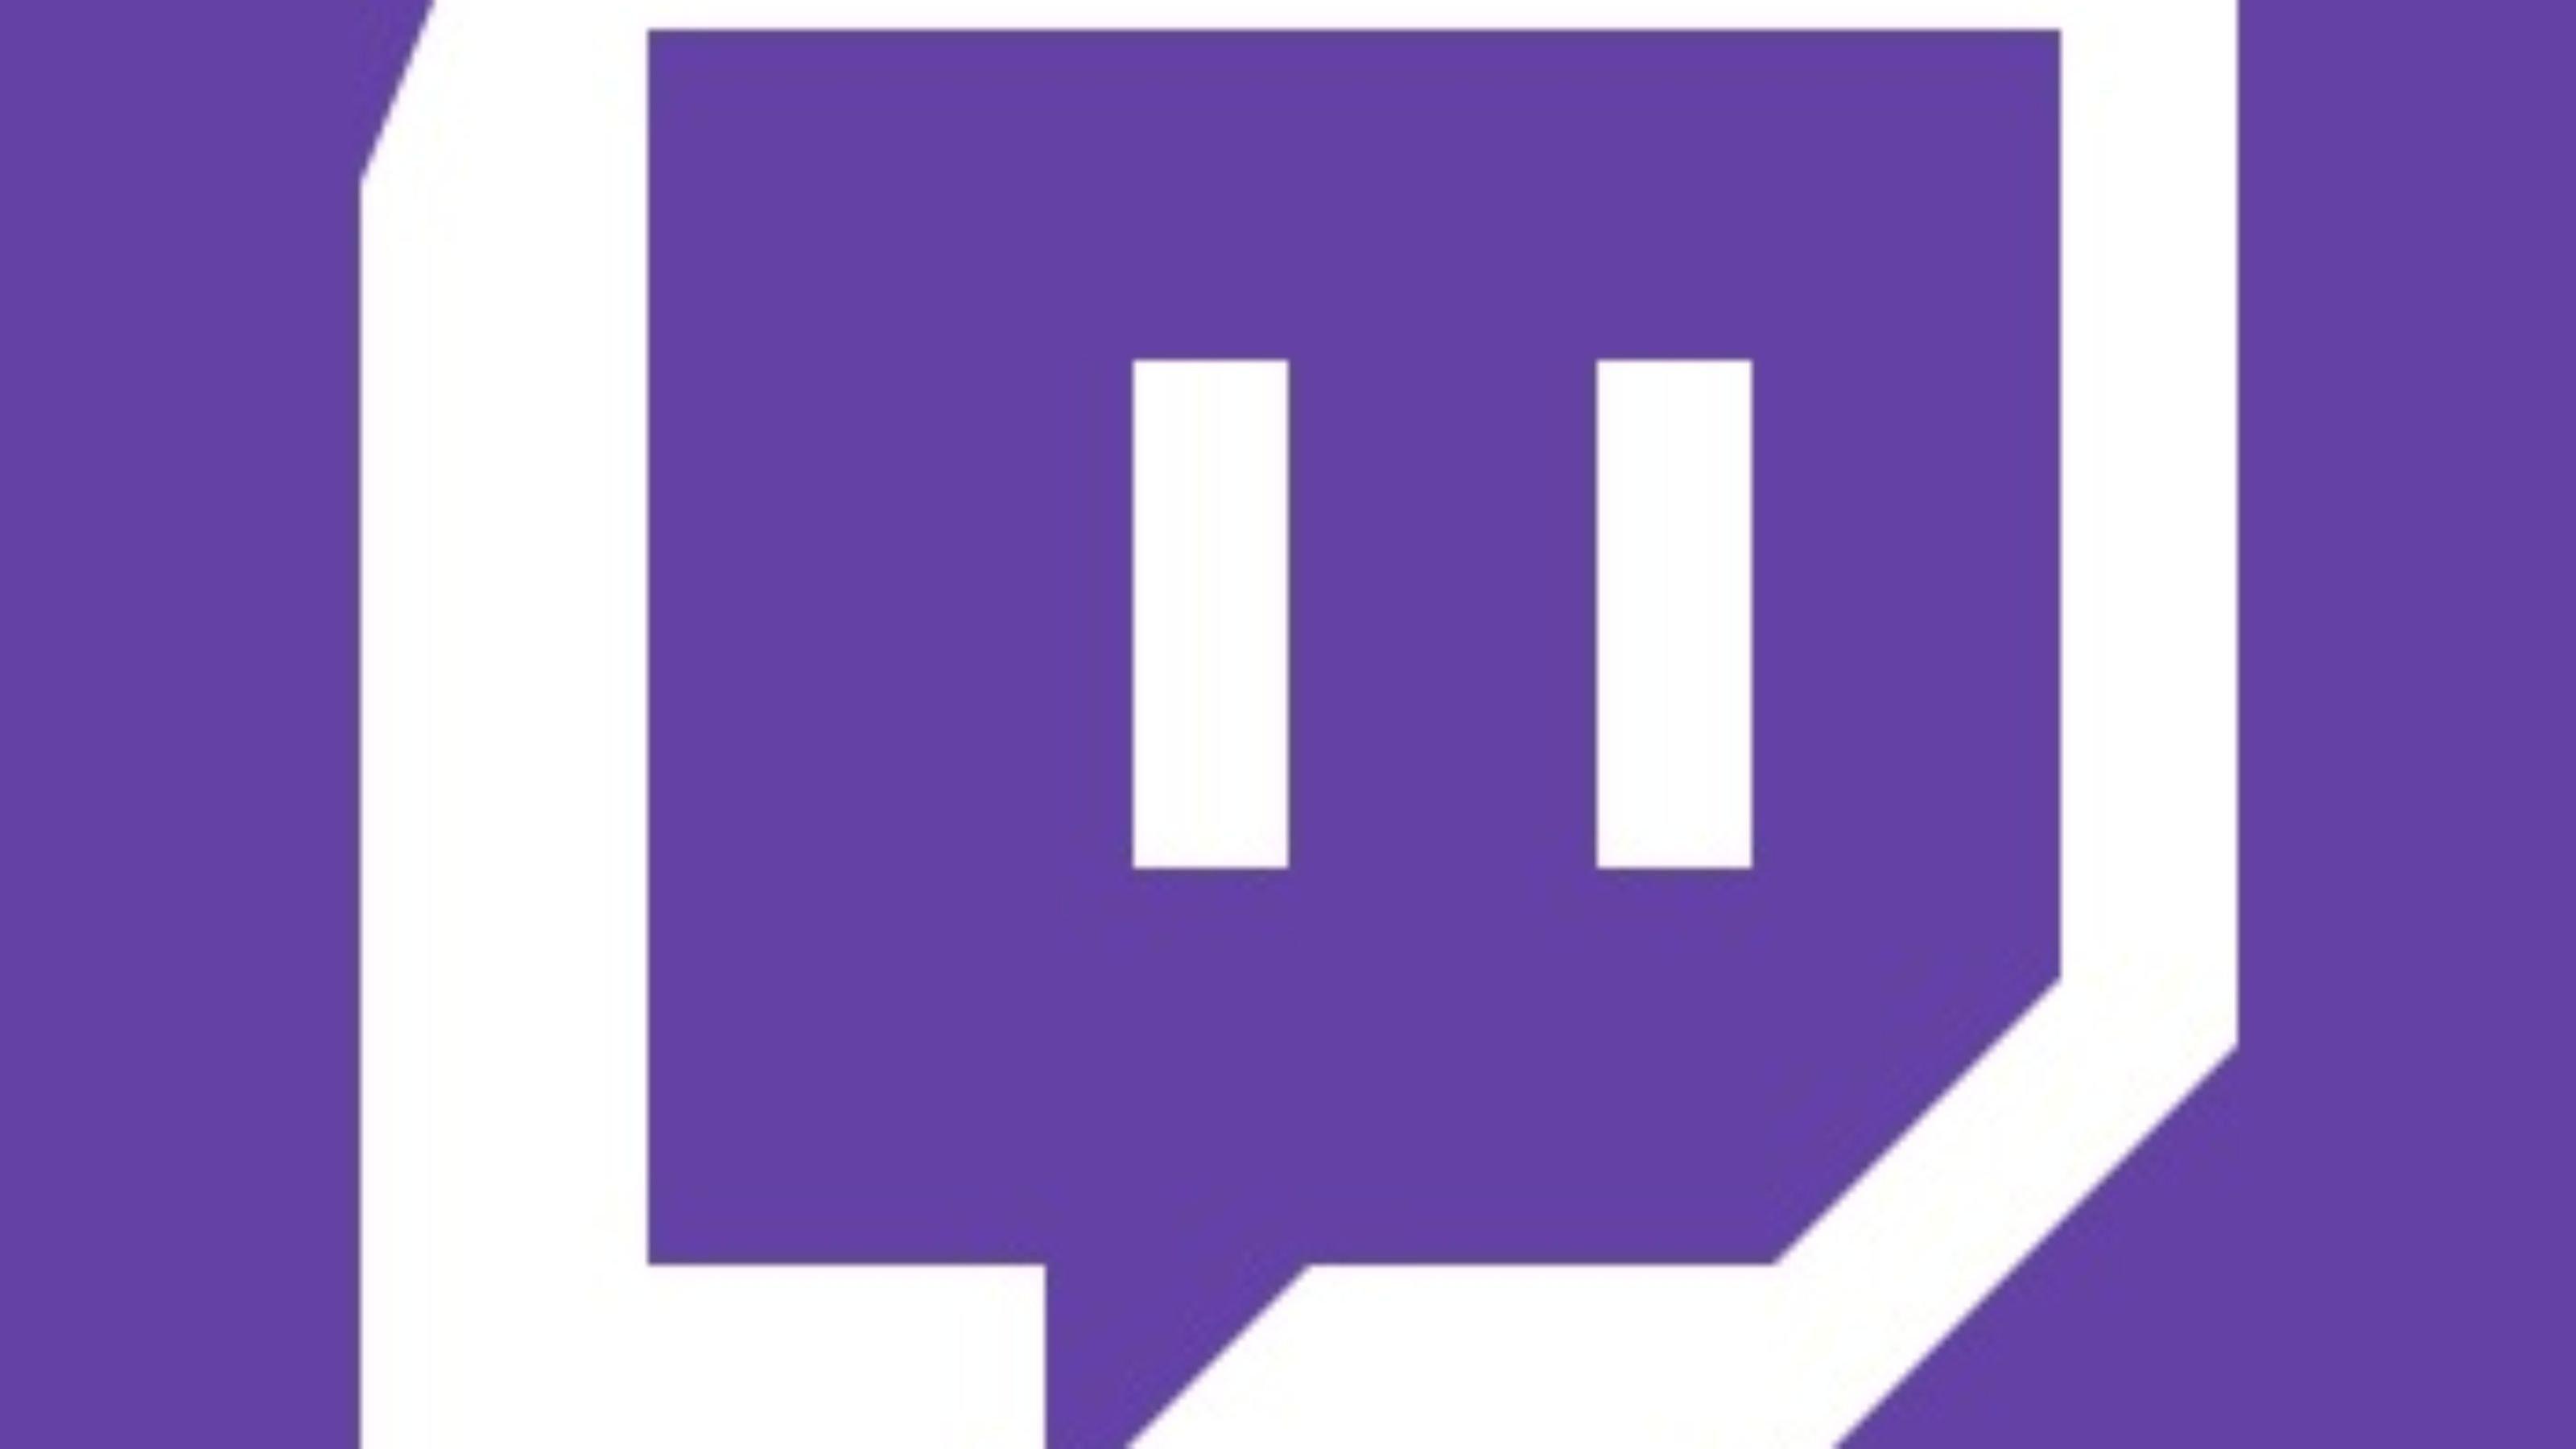 how to play spotify on twitch xbox one